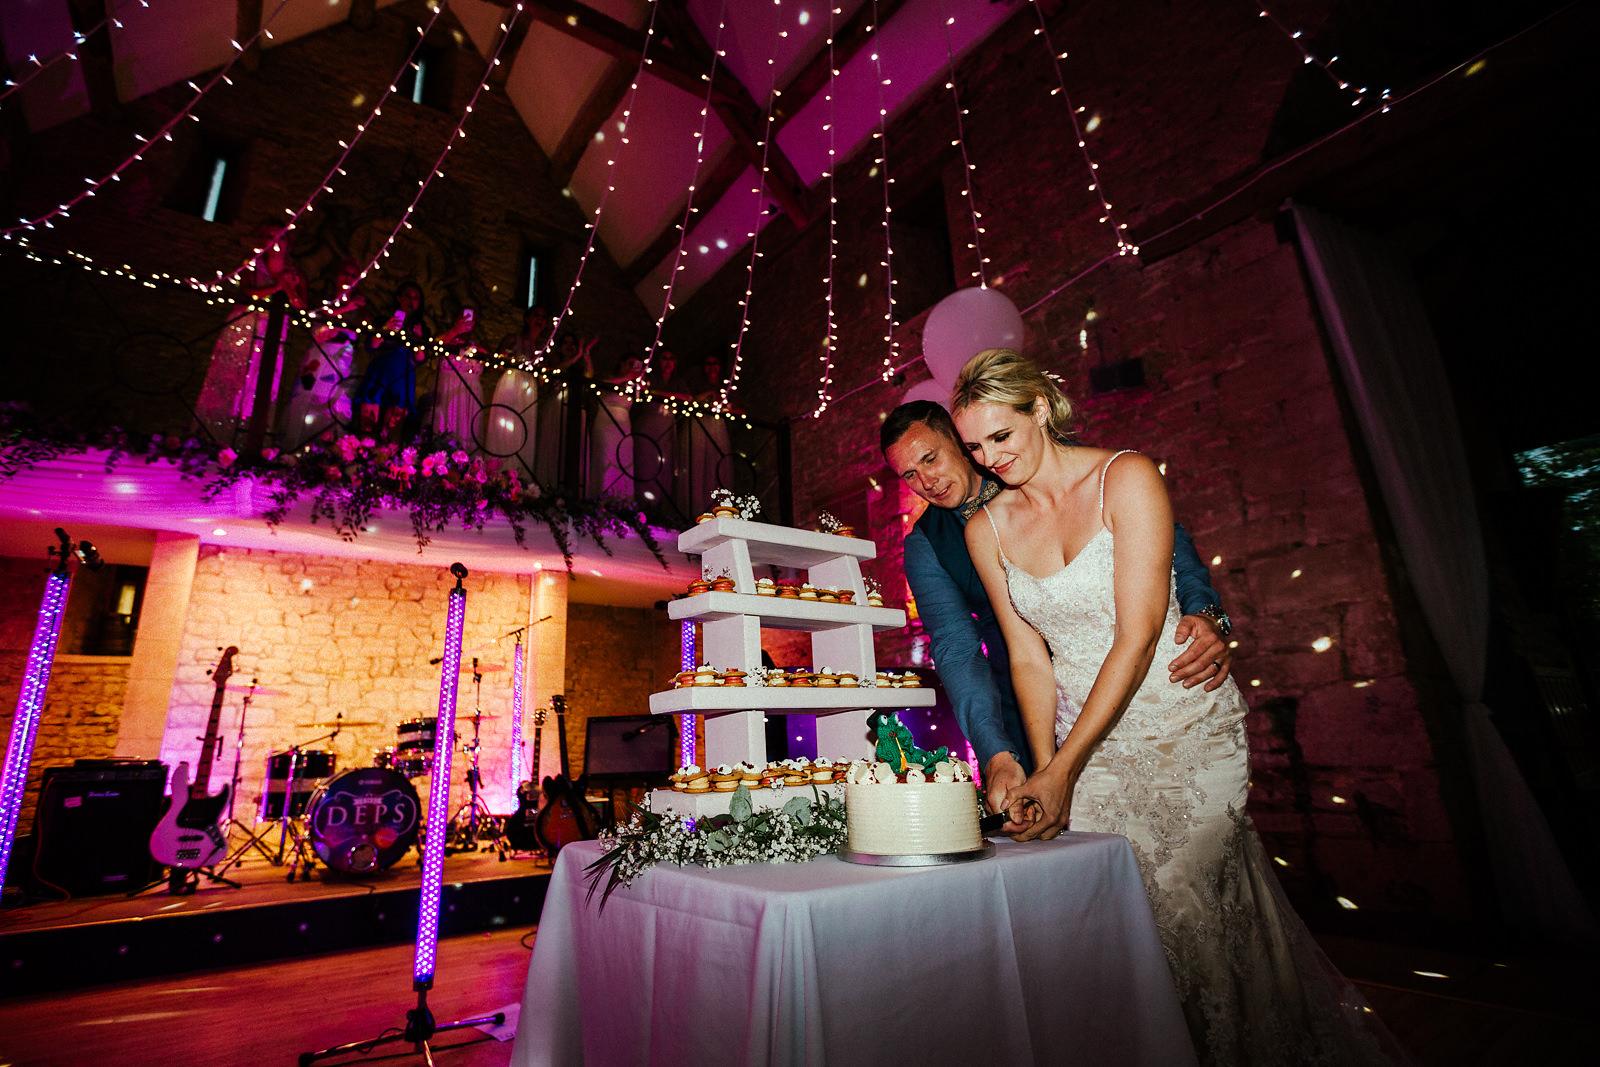 Tetbury barn wedding cake photography